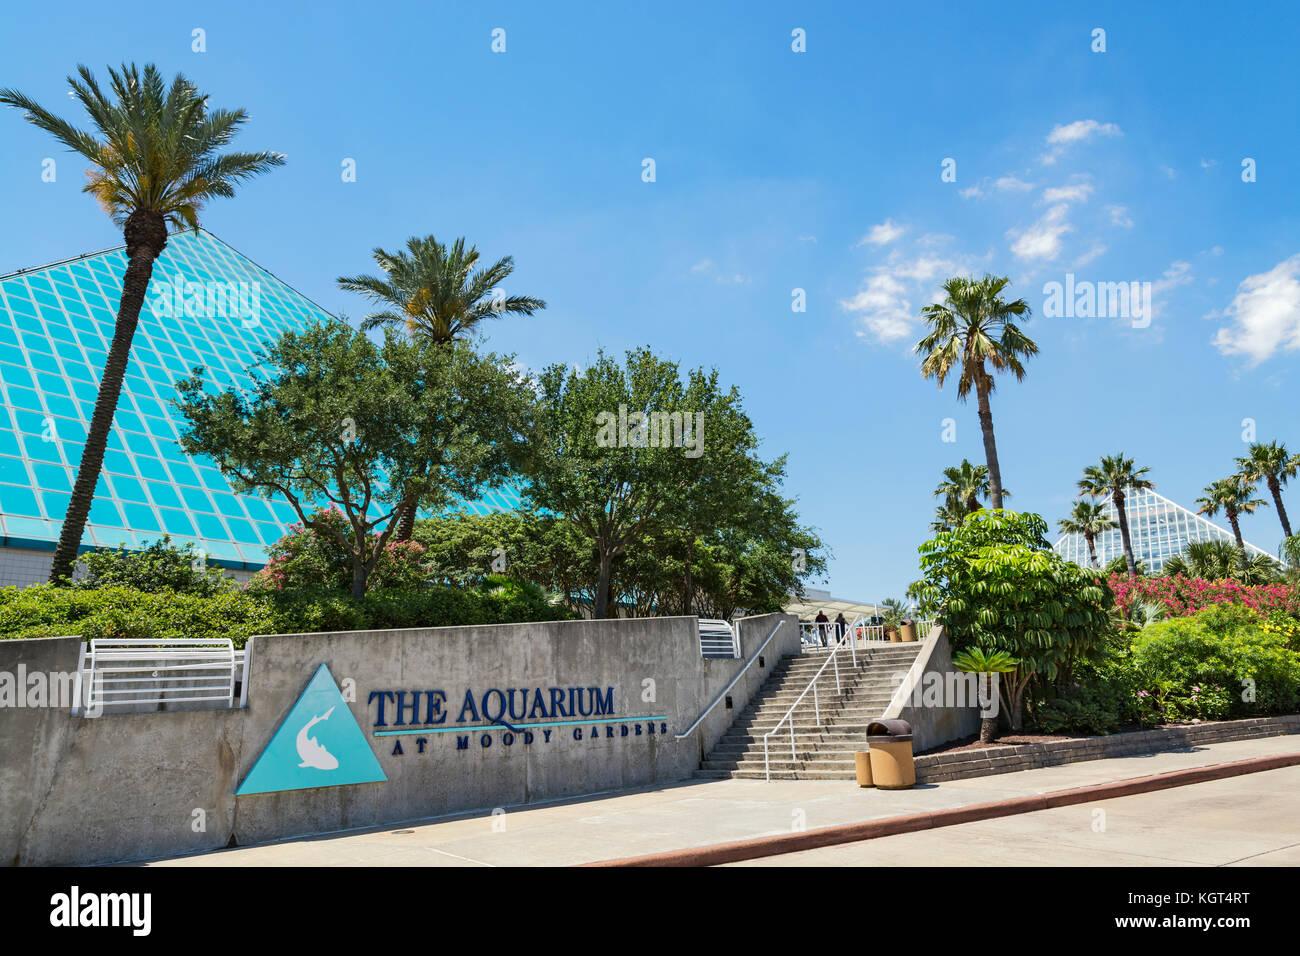 Texas, Galveston, Moody Gardens, The Aquarium Pyramid, Rainforest Pyramid  Right